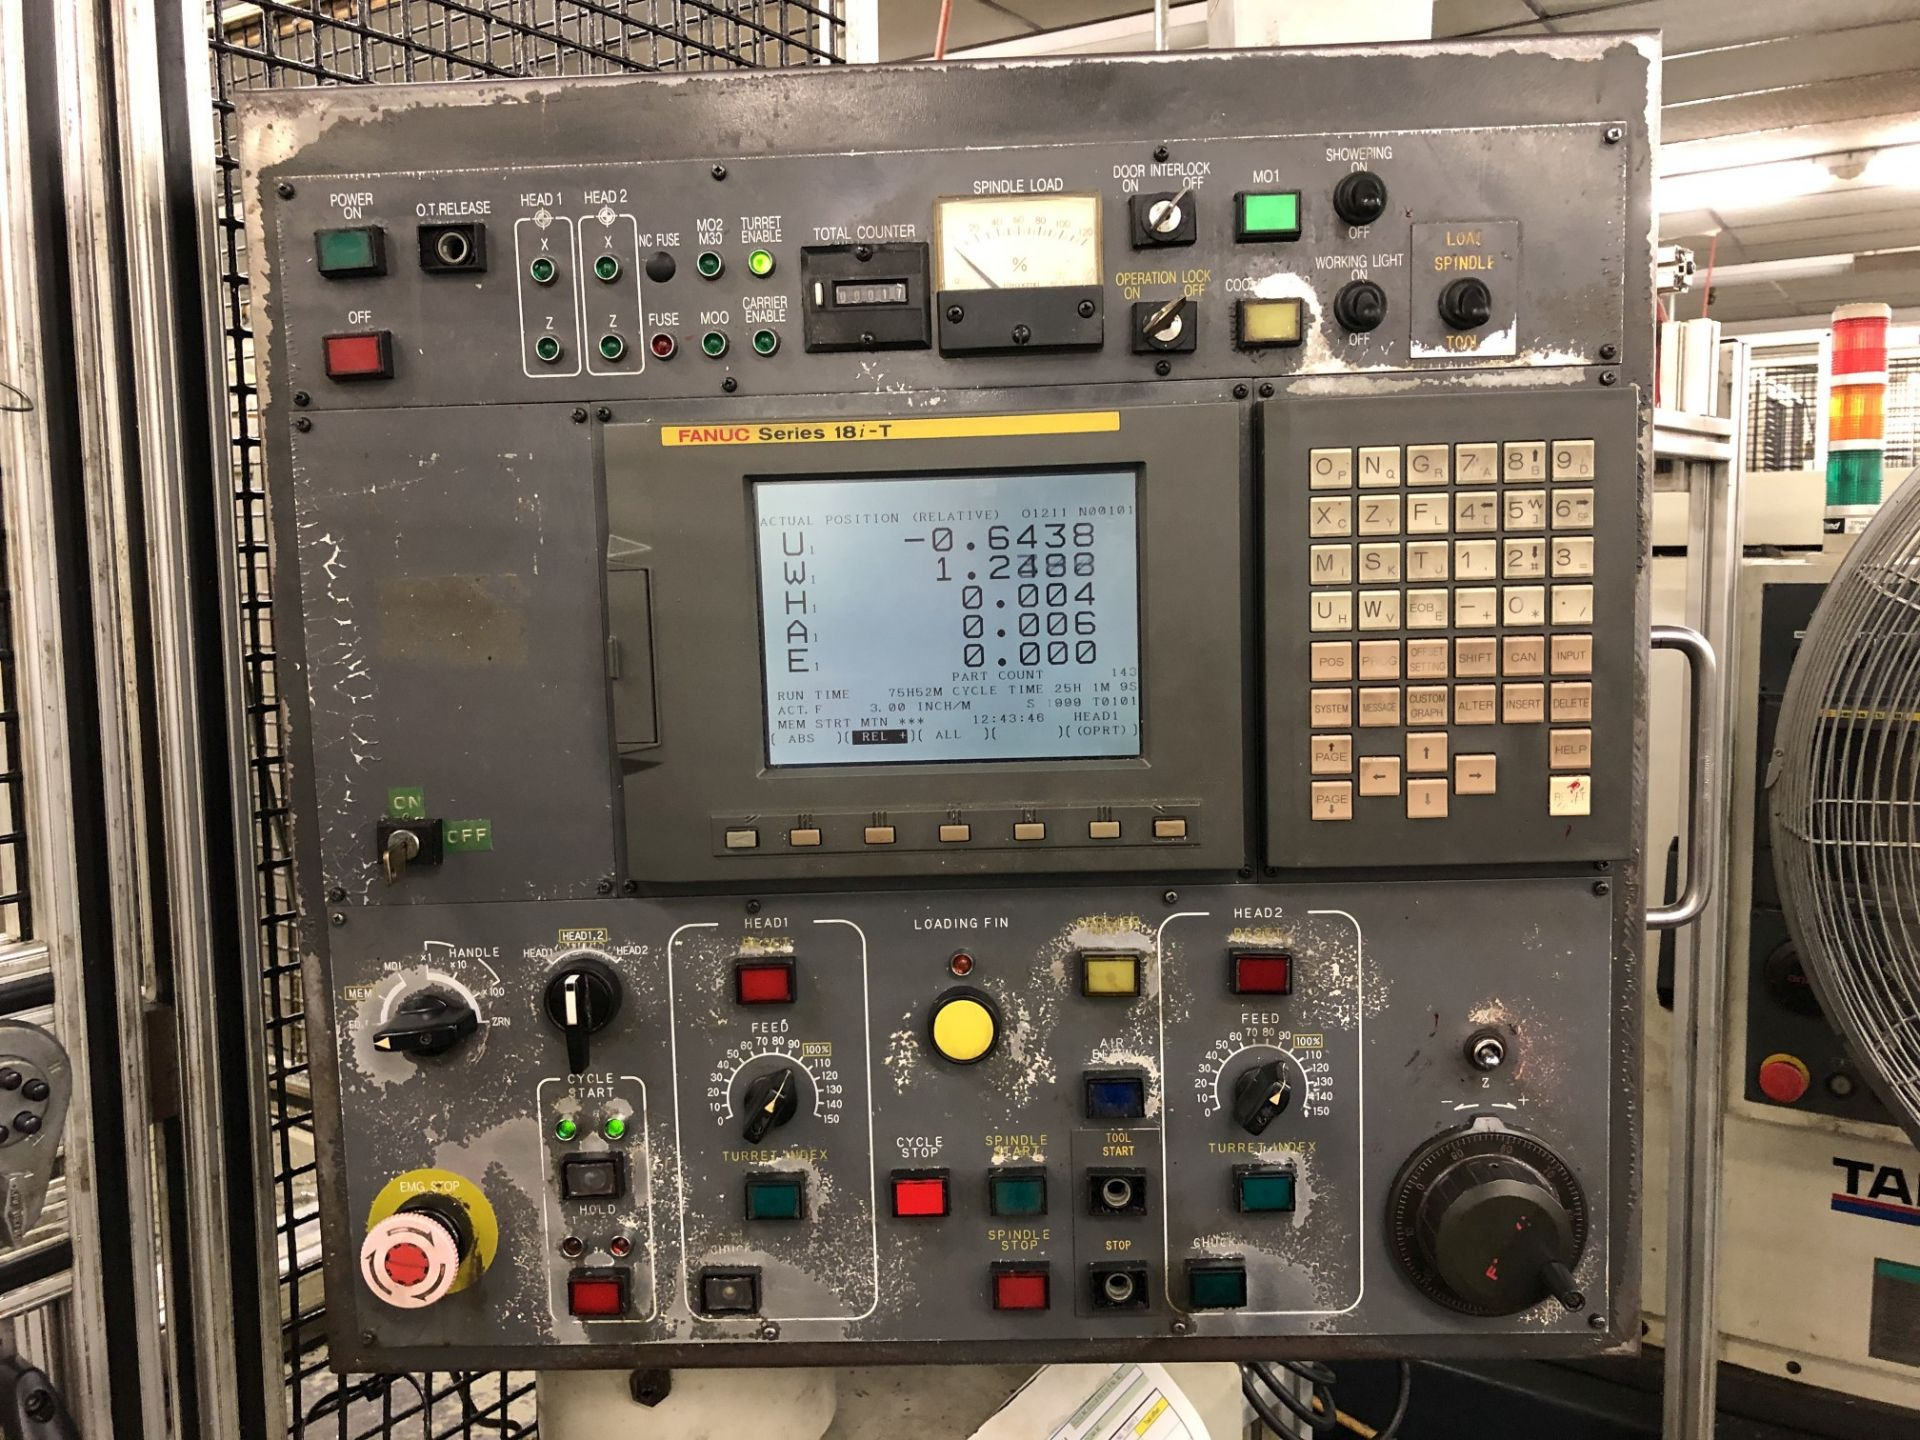 1999 Kitako MT4-200M Multi-Spindle CNC Turning Mill - Image 6 of 19